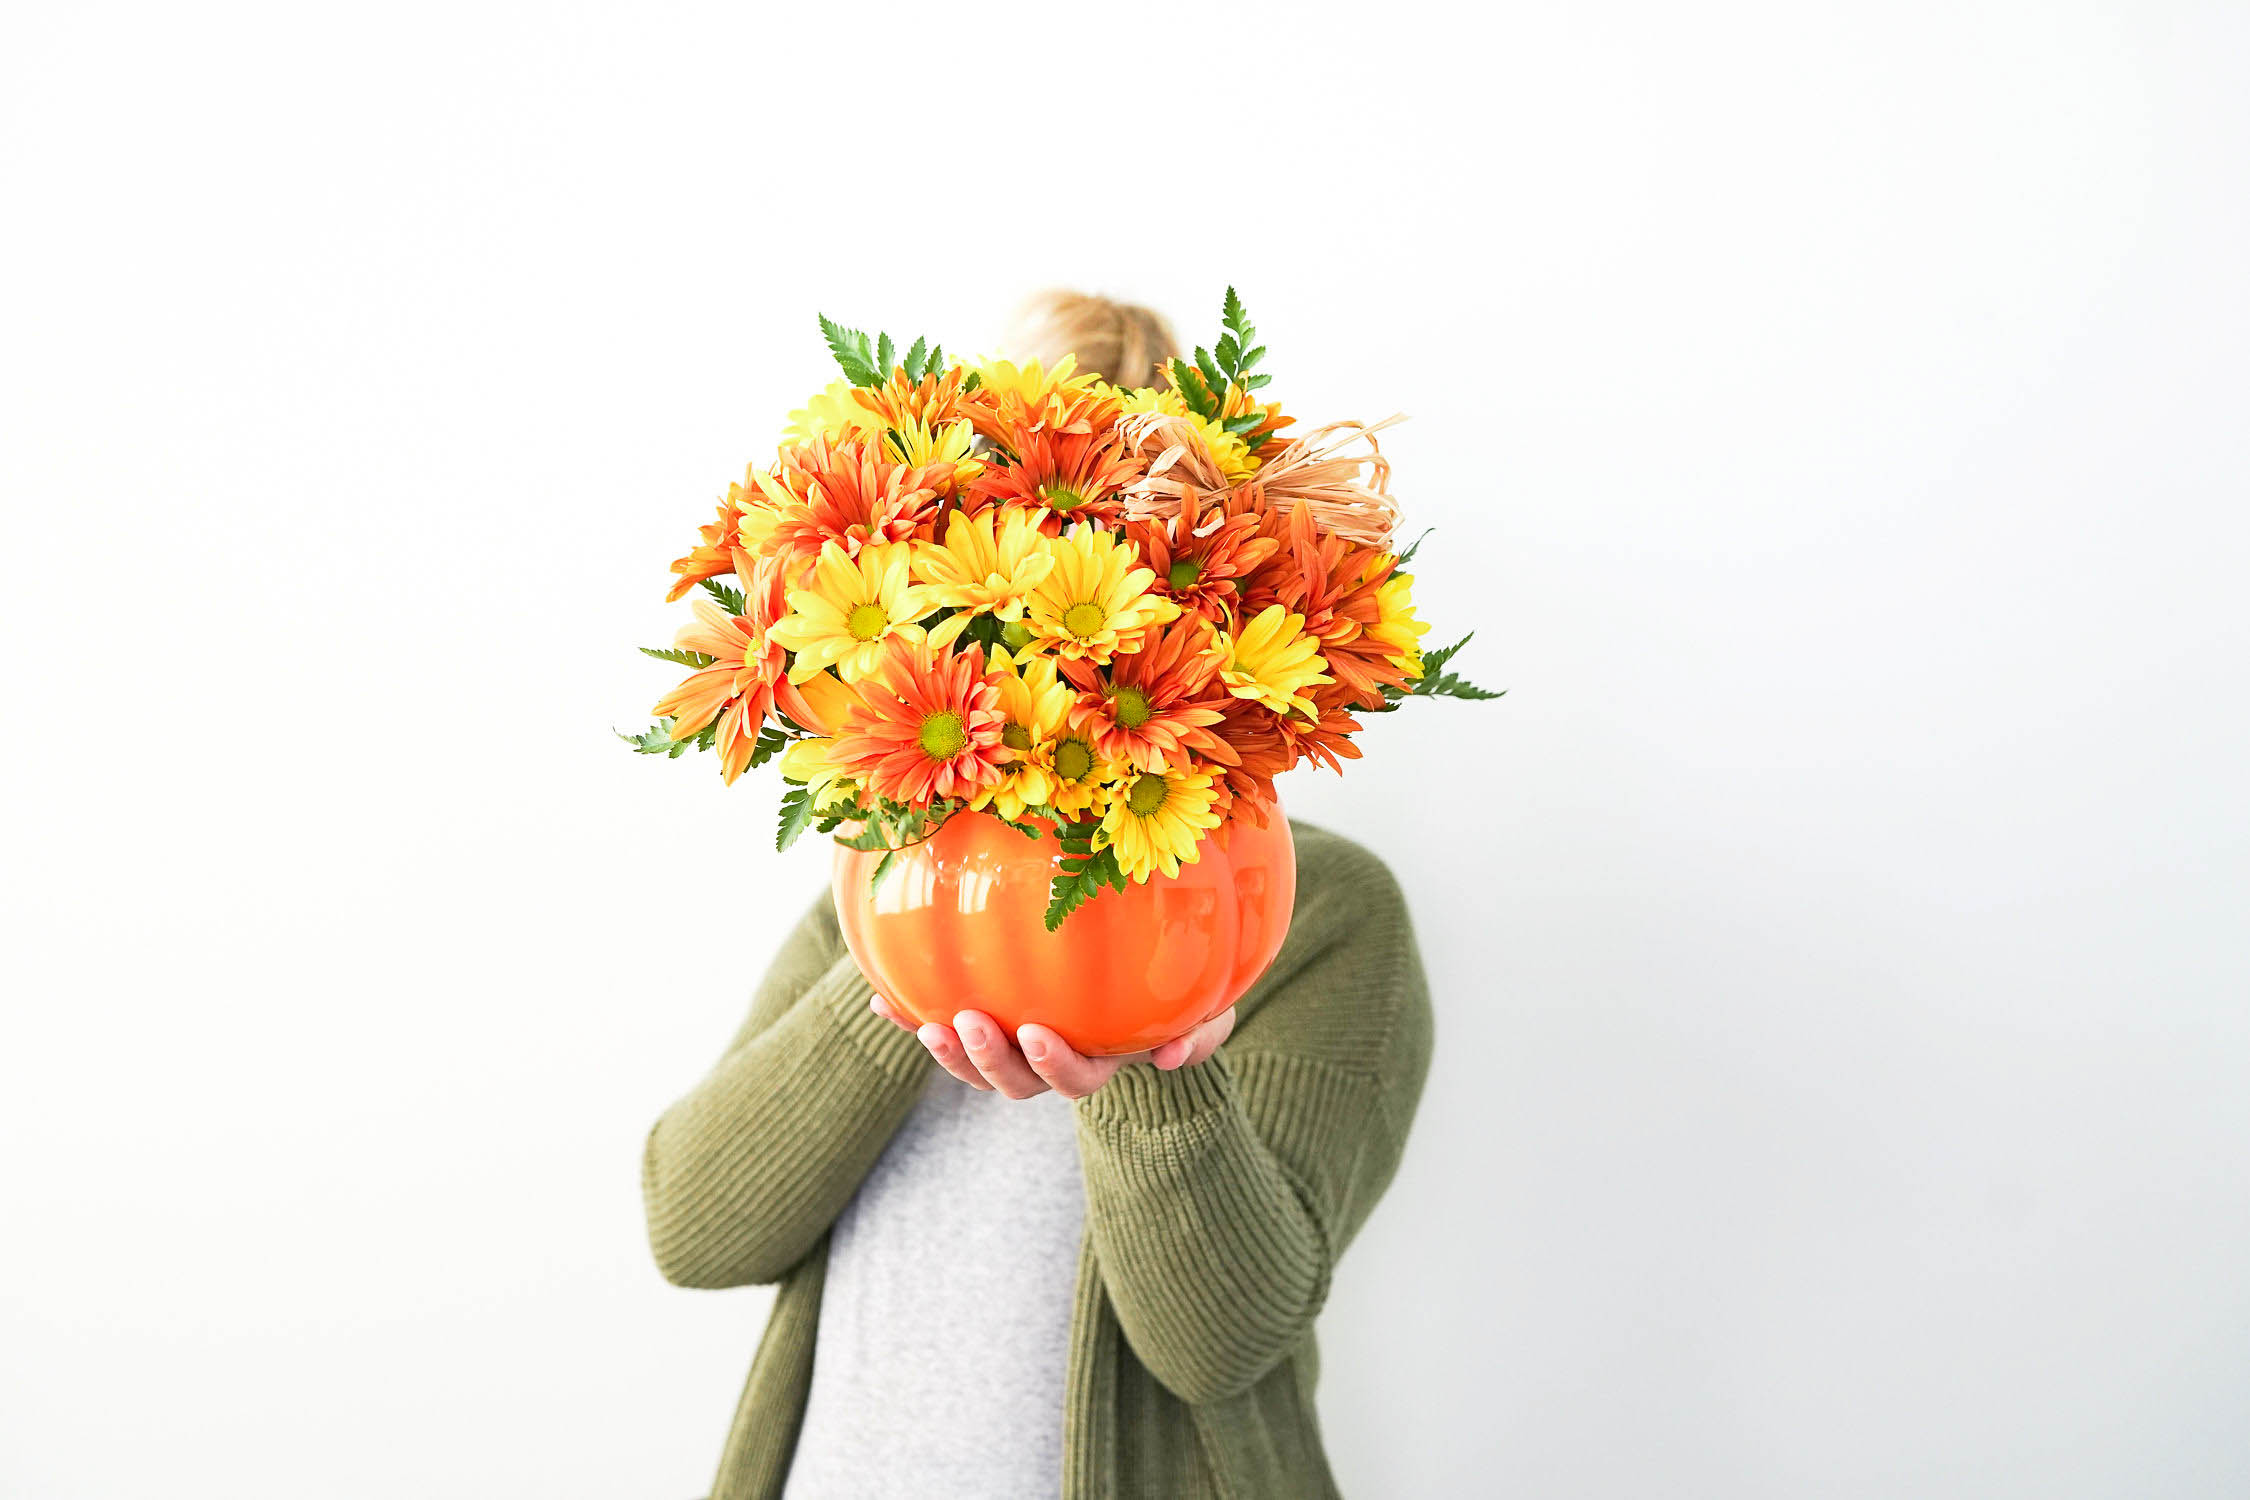 Pumpkin_vase.jpg